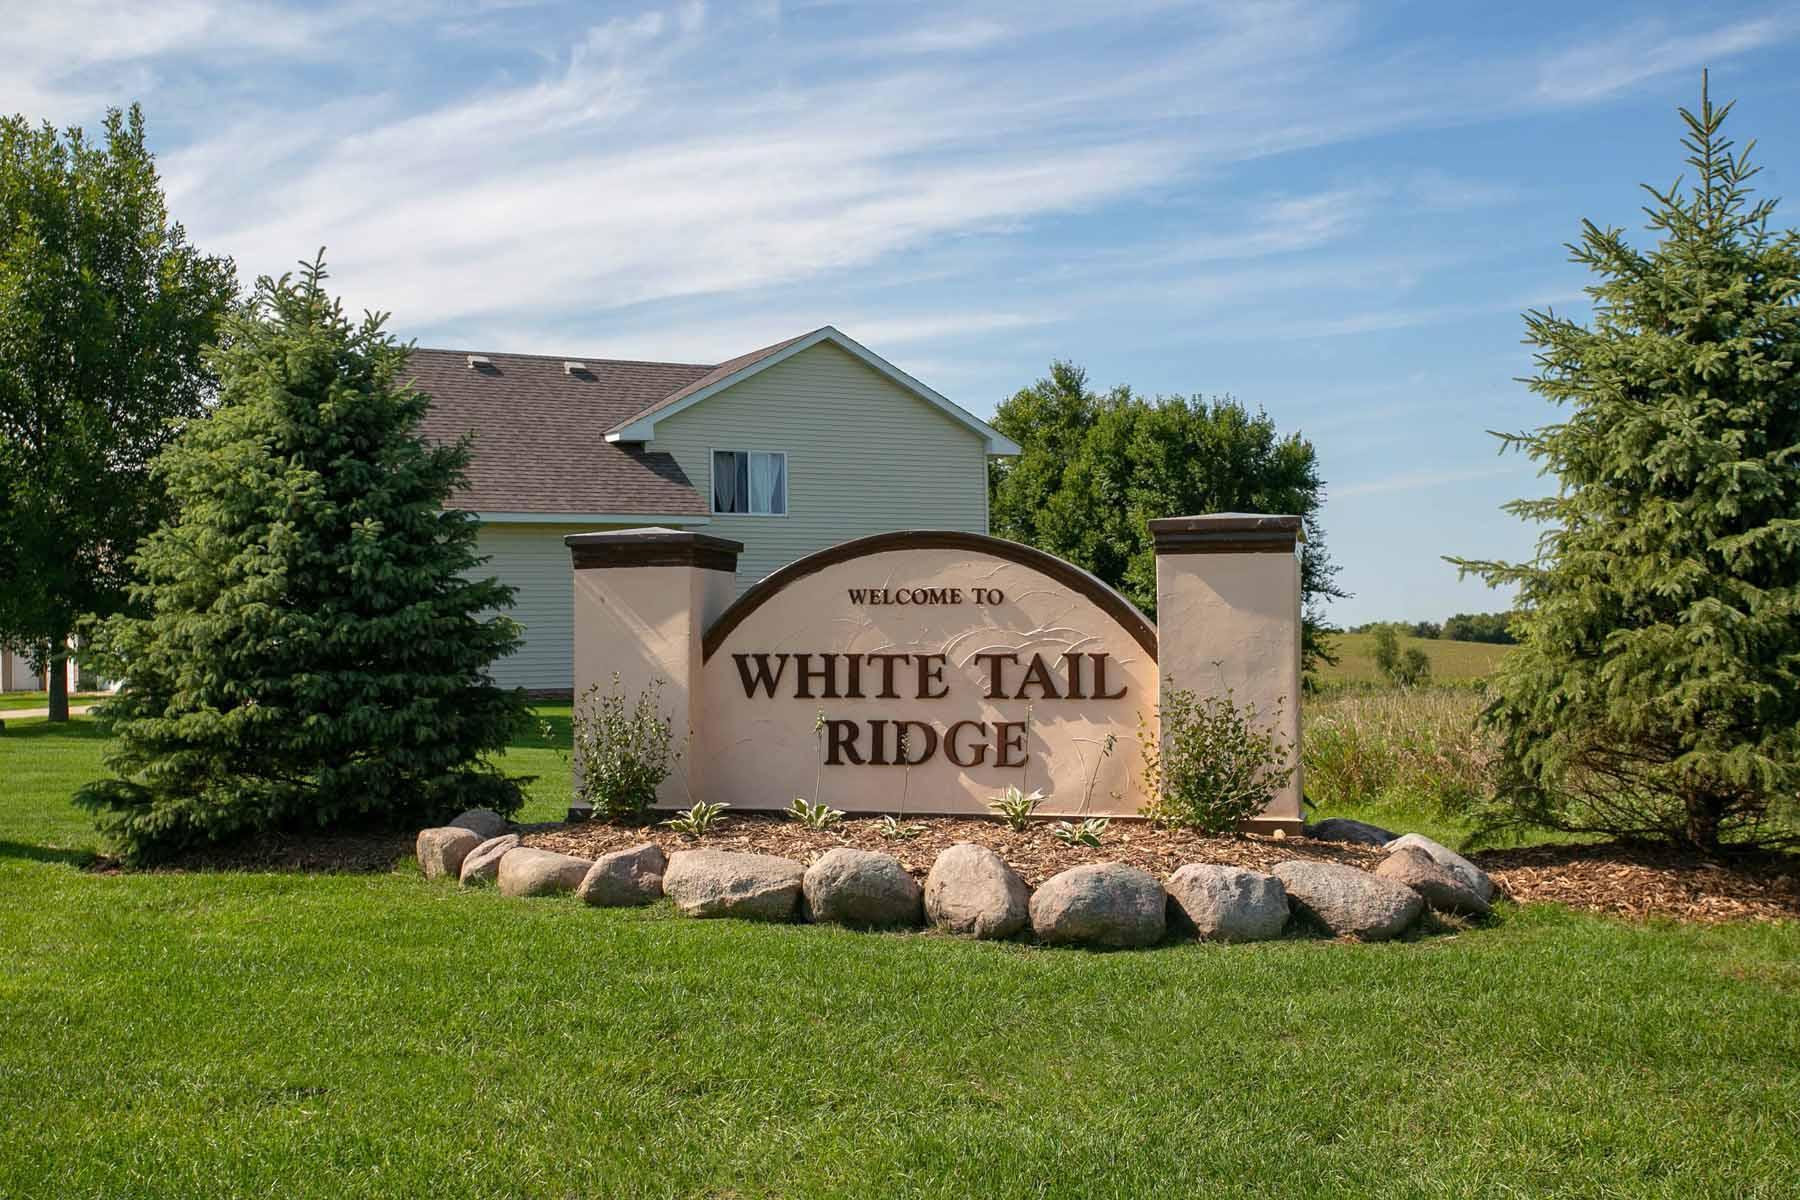 LGI Homes at White Tail Ridge:LGI Homes at White Tail Ridge